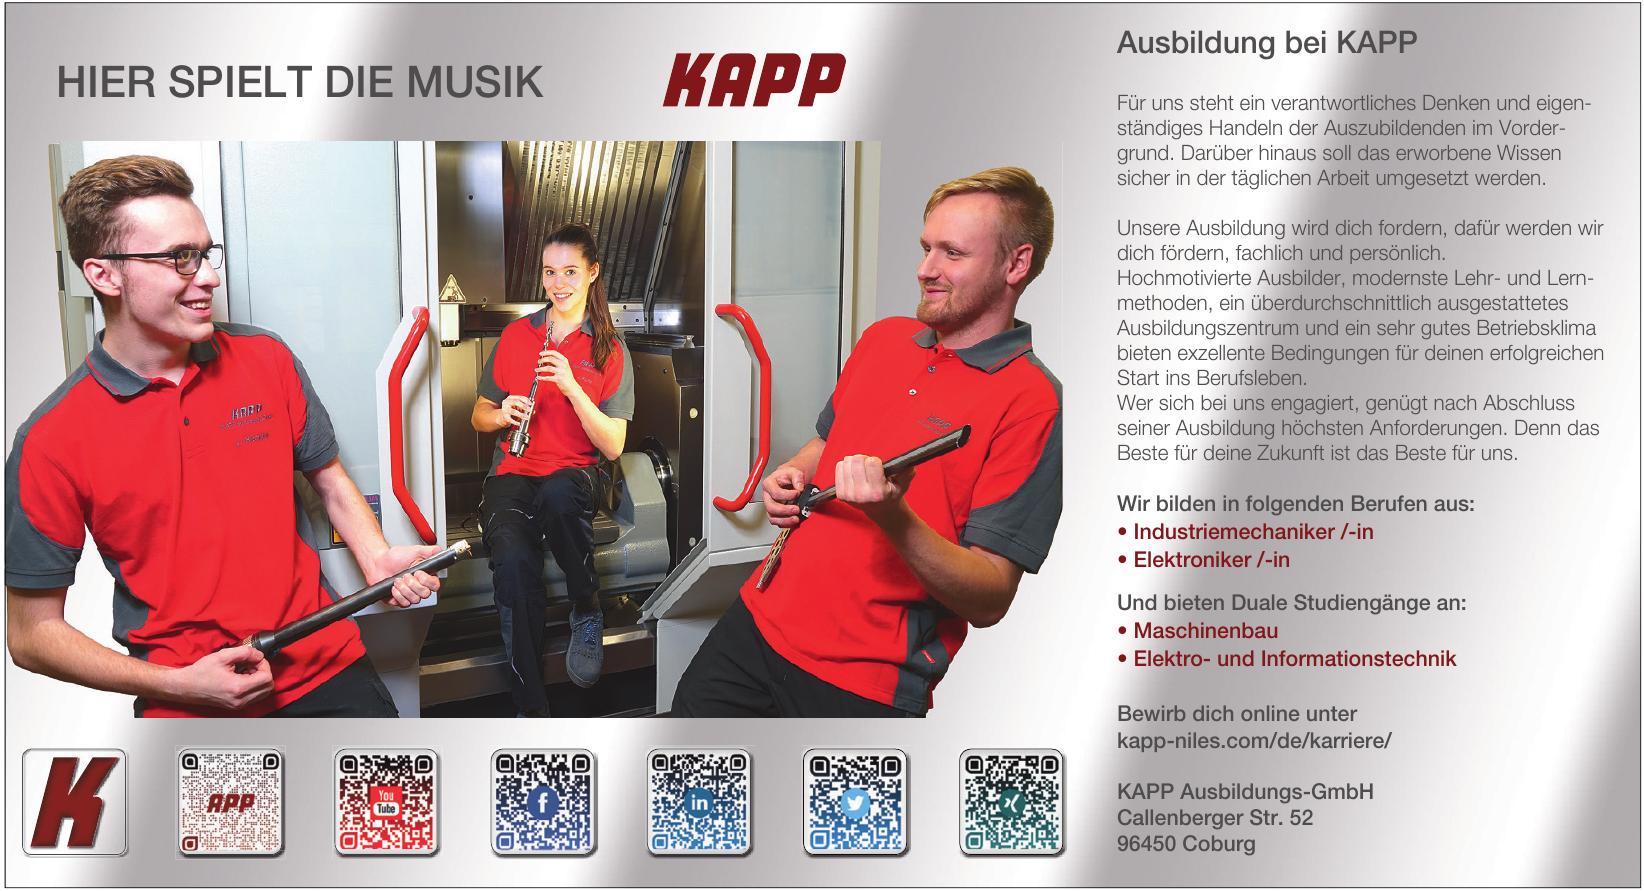 KAPP Ausbildungs-GmbH